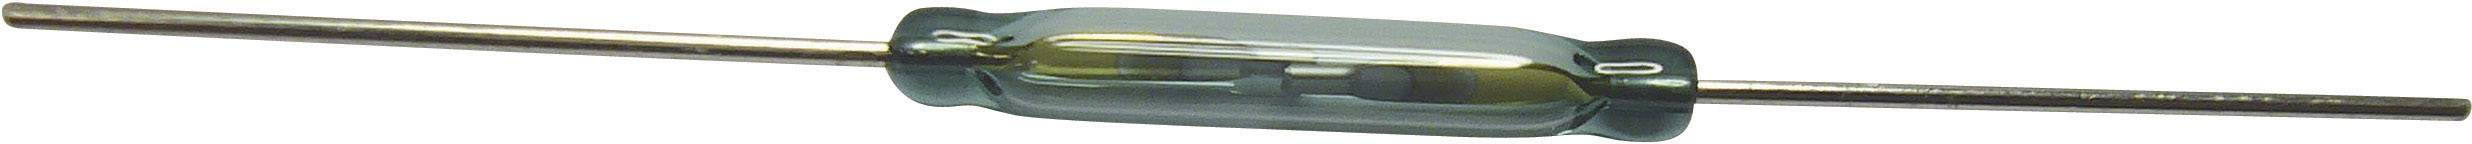 Jazyčkový kontakt Hamlin FLEX-14, 1 spínací, 200 V/DC, 0.5 A, 10 W